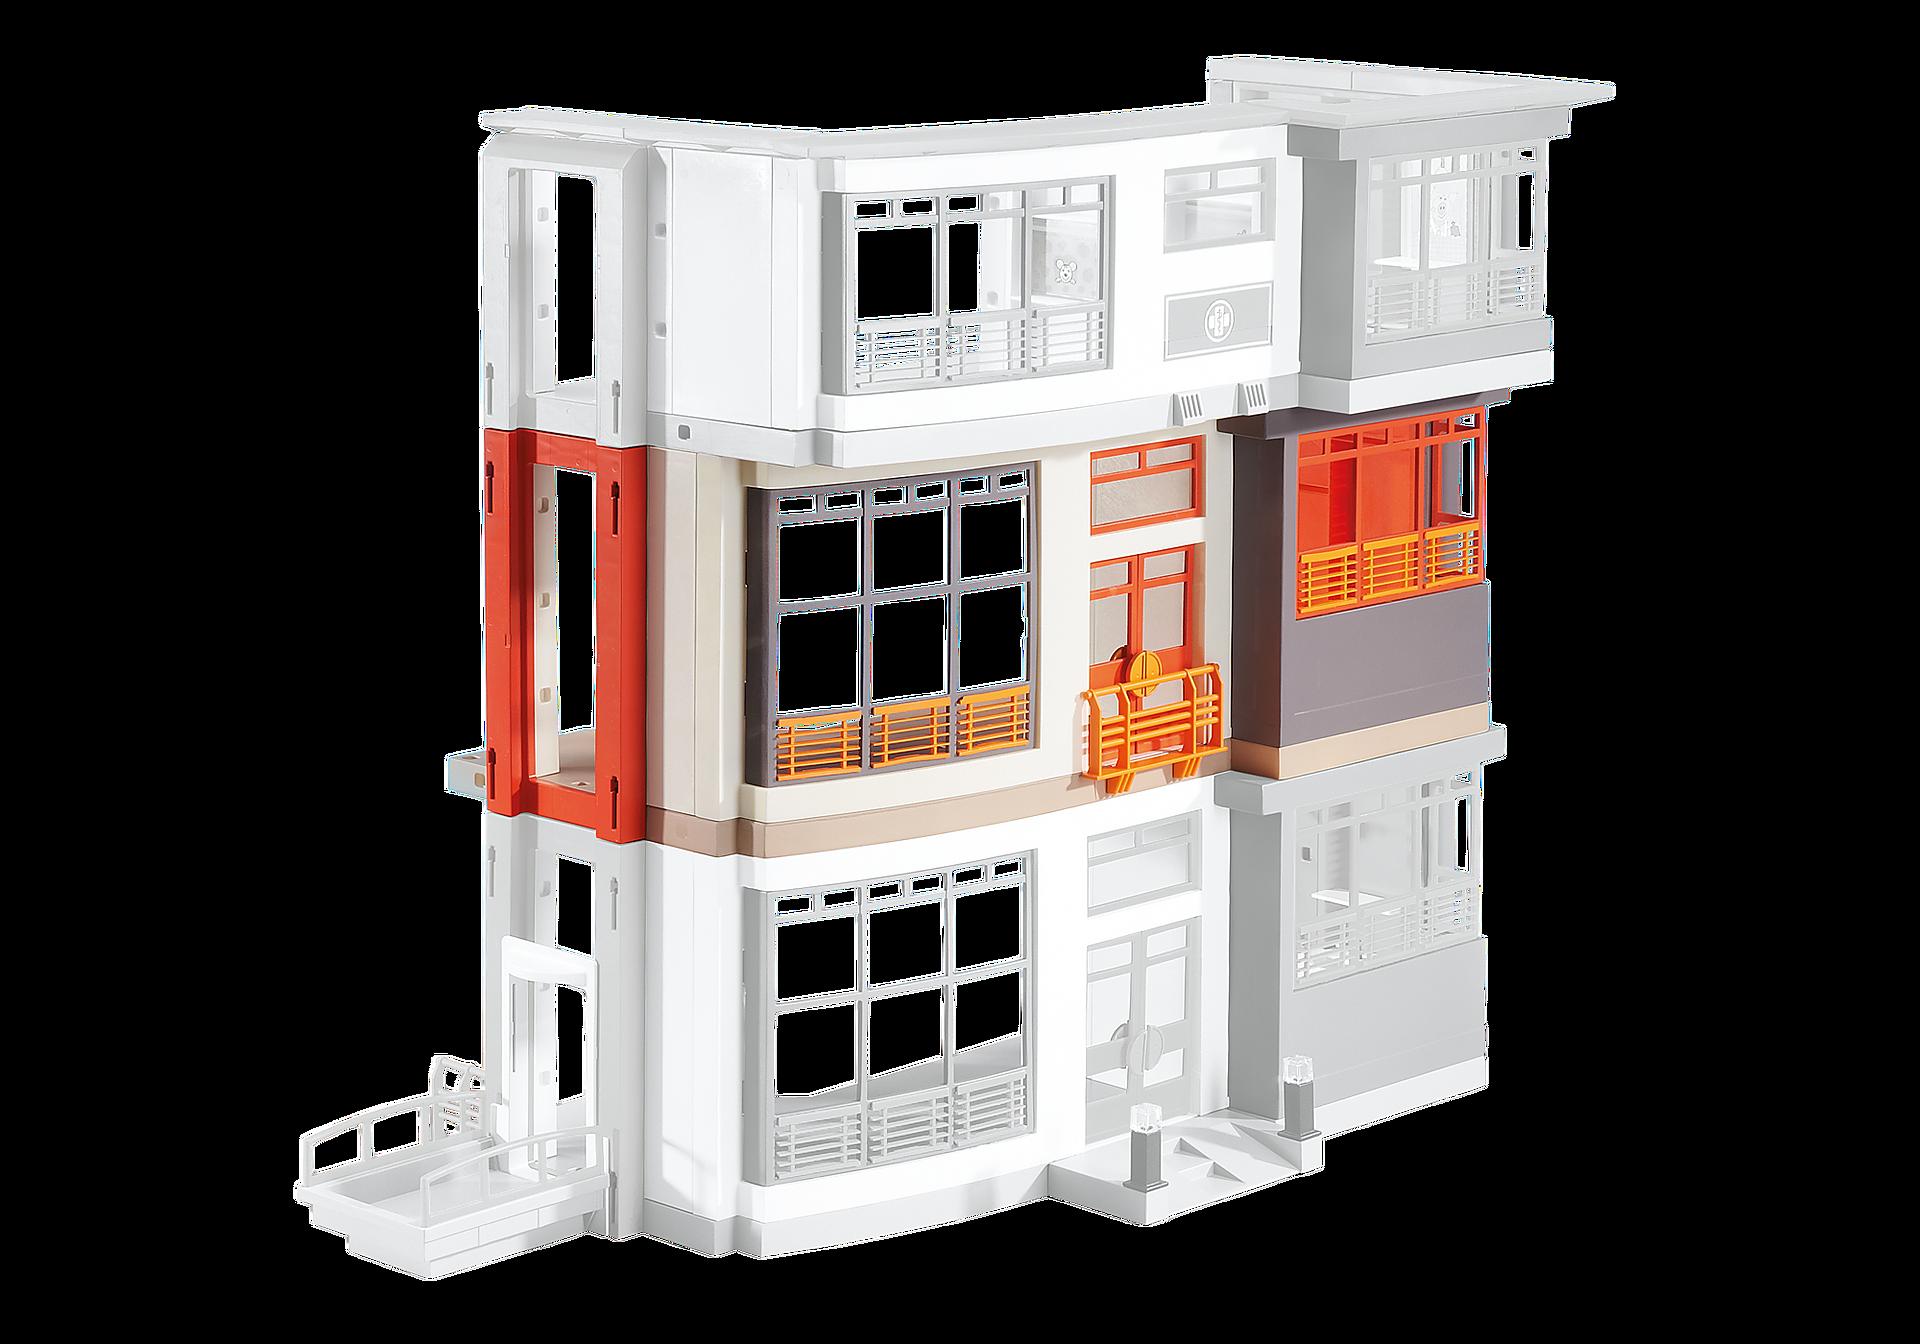 6443 Floor Extension for Furnished Children's Hospital (6657) zoom image1